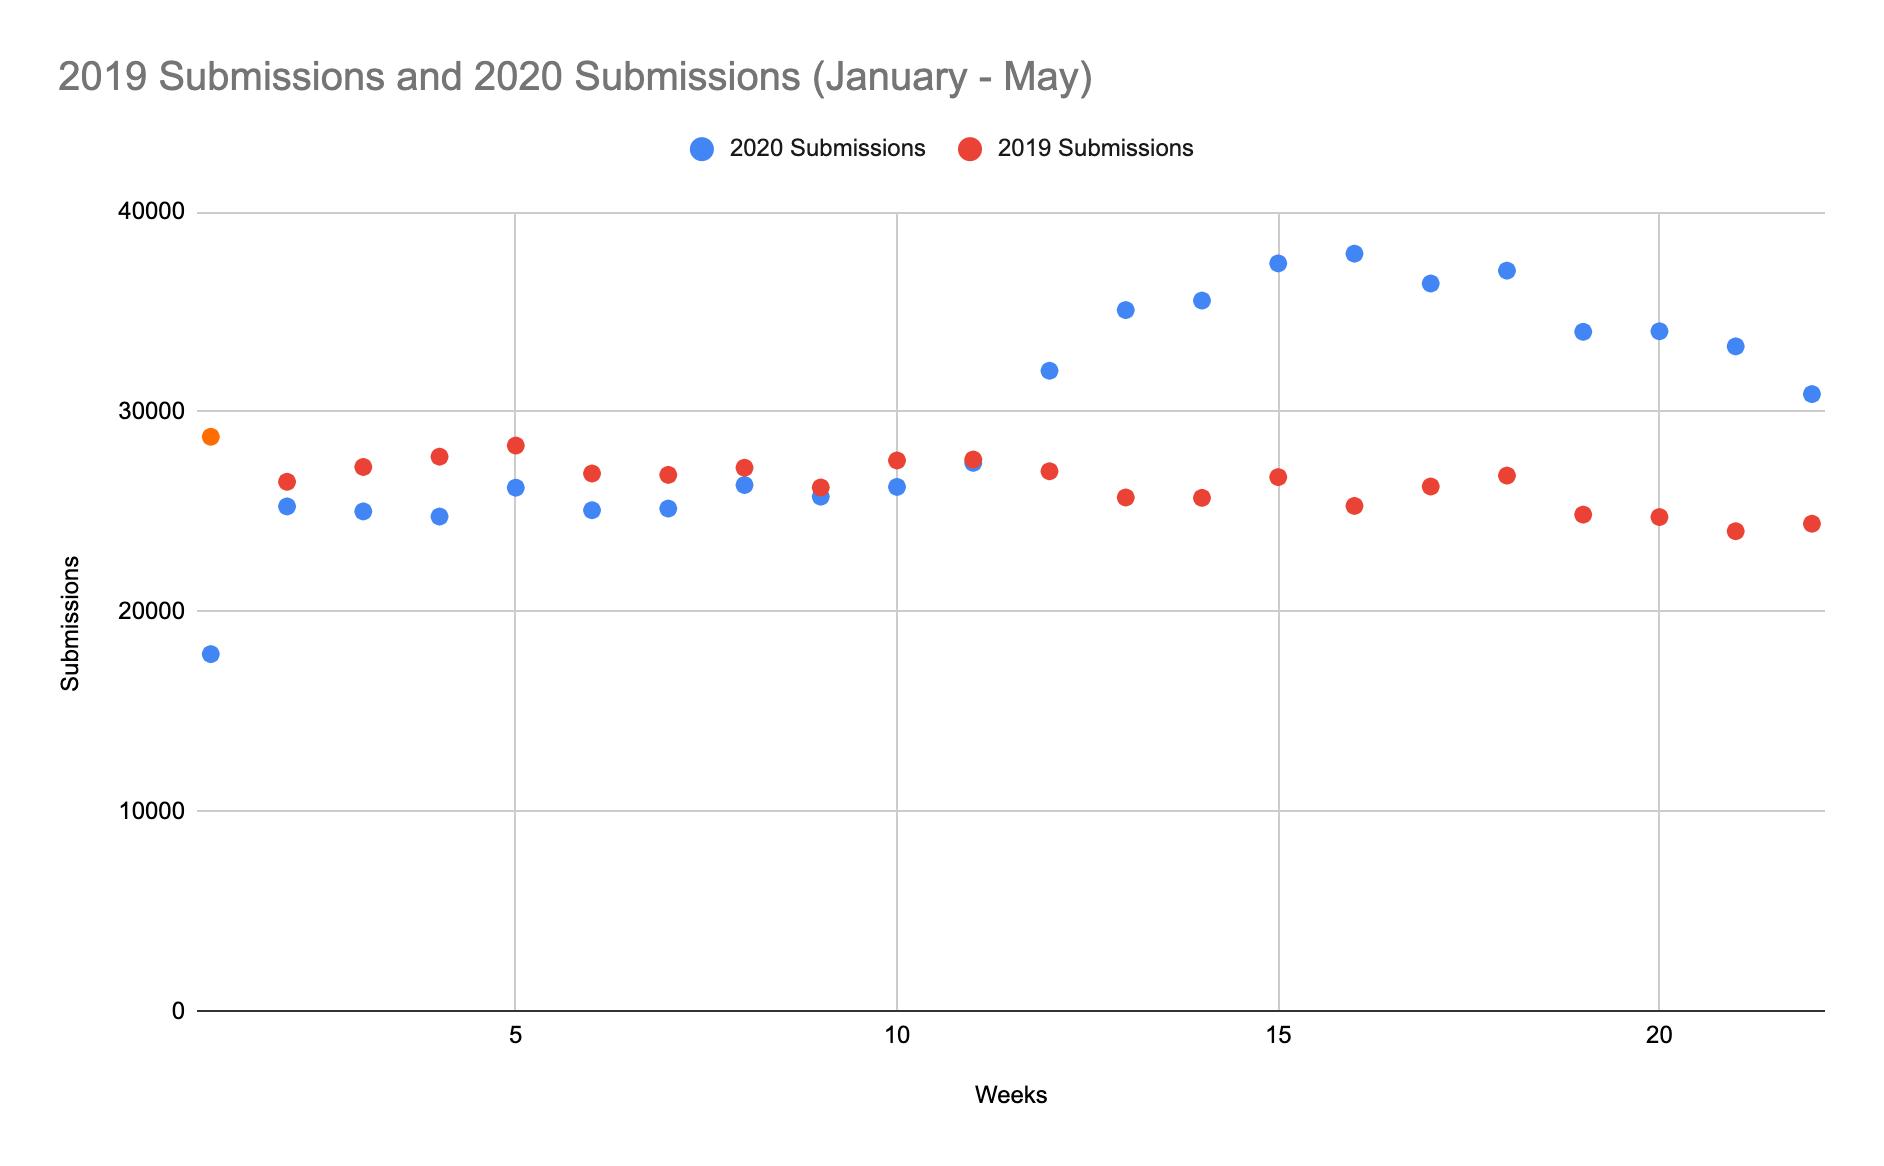 2020 database recap early 2020